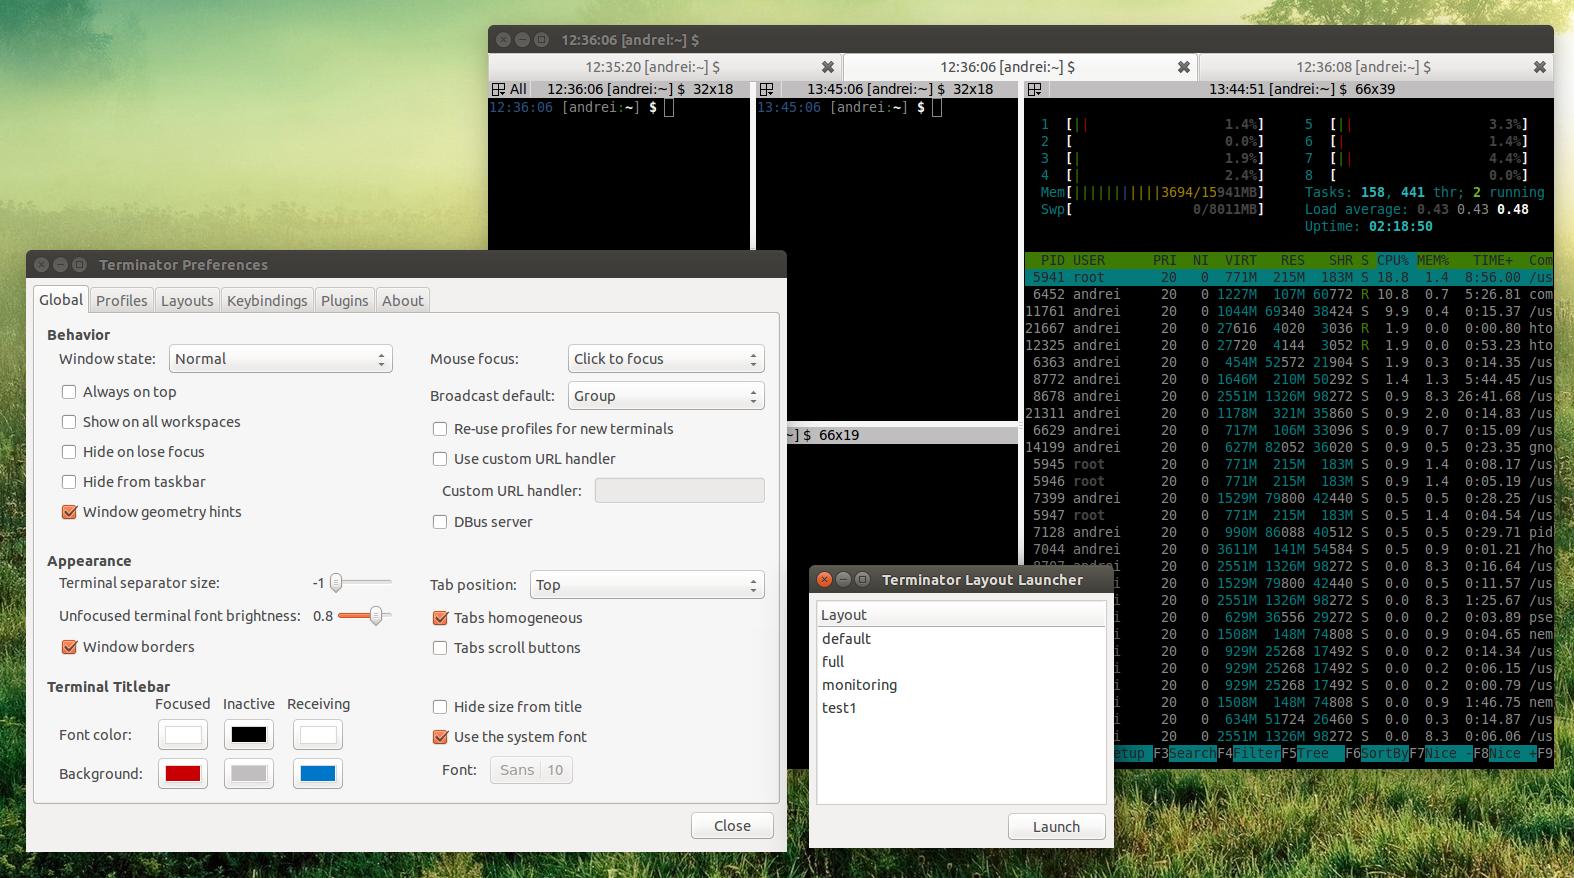 Terminator App for Ubuntu